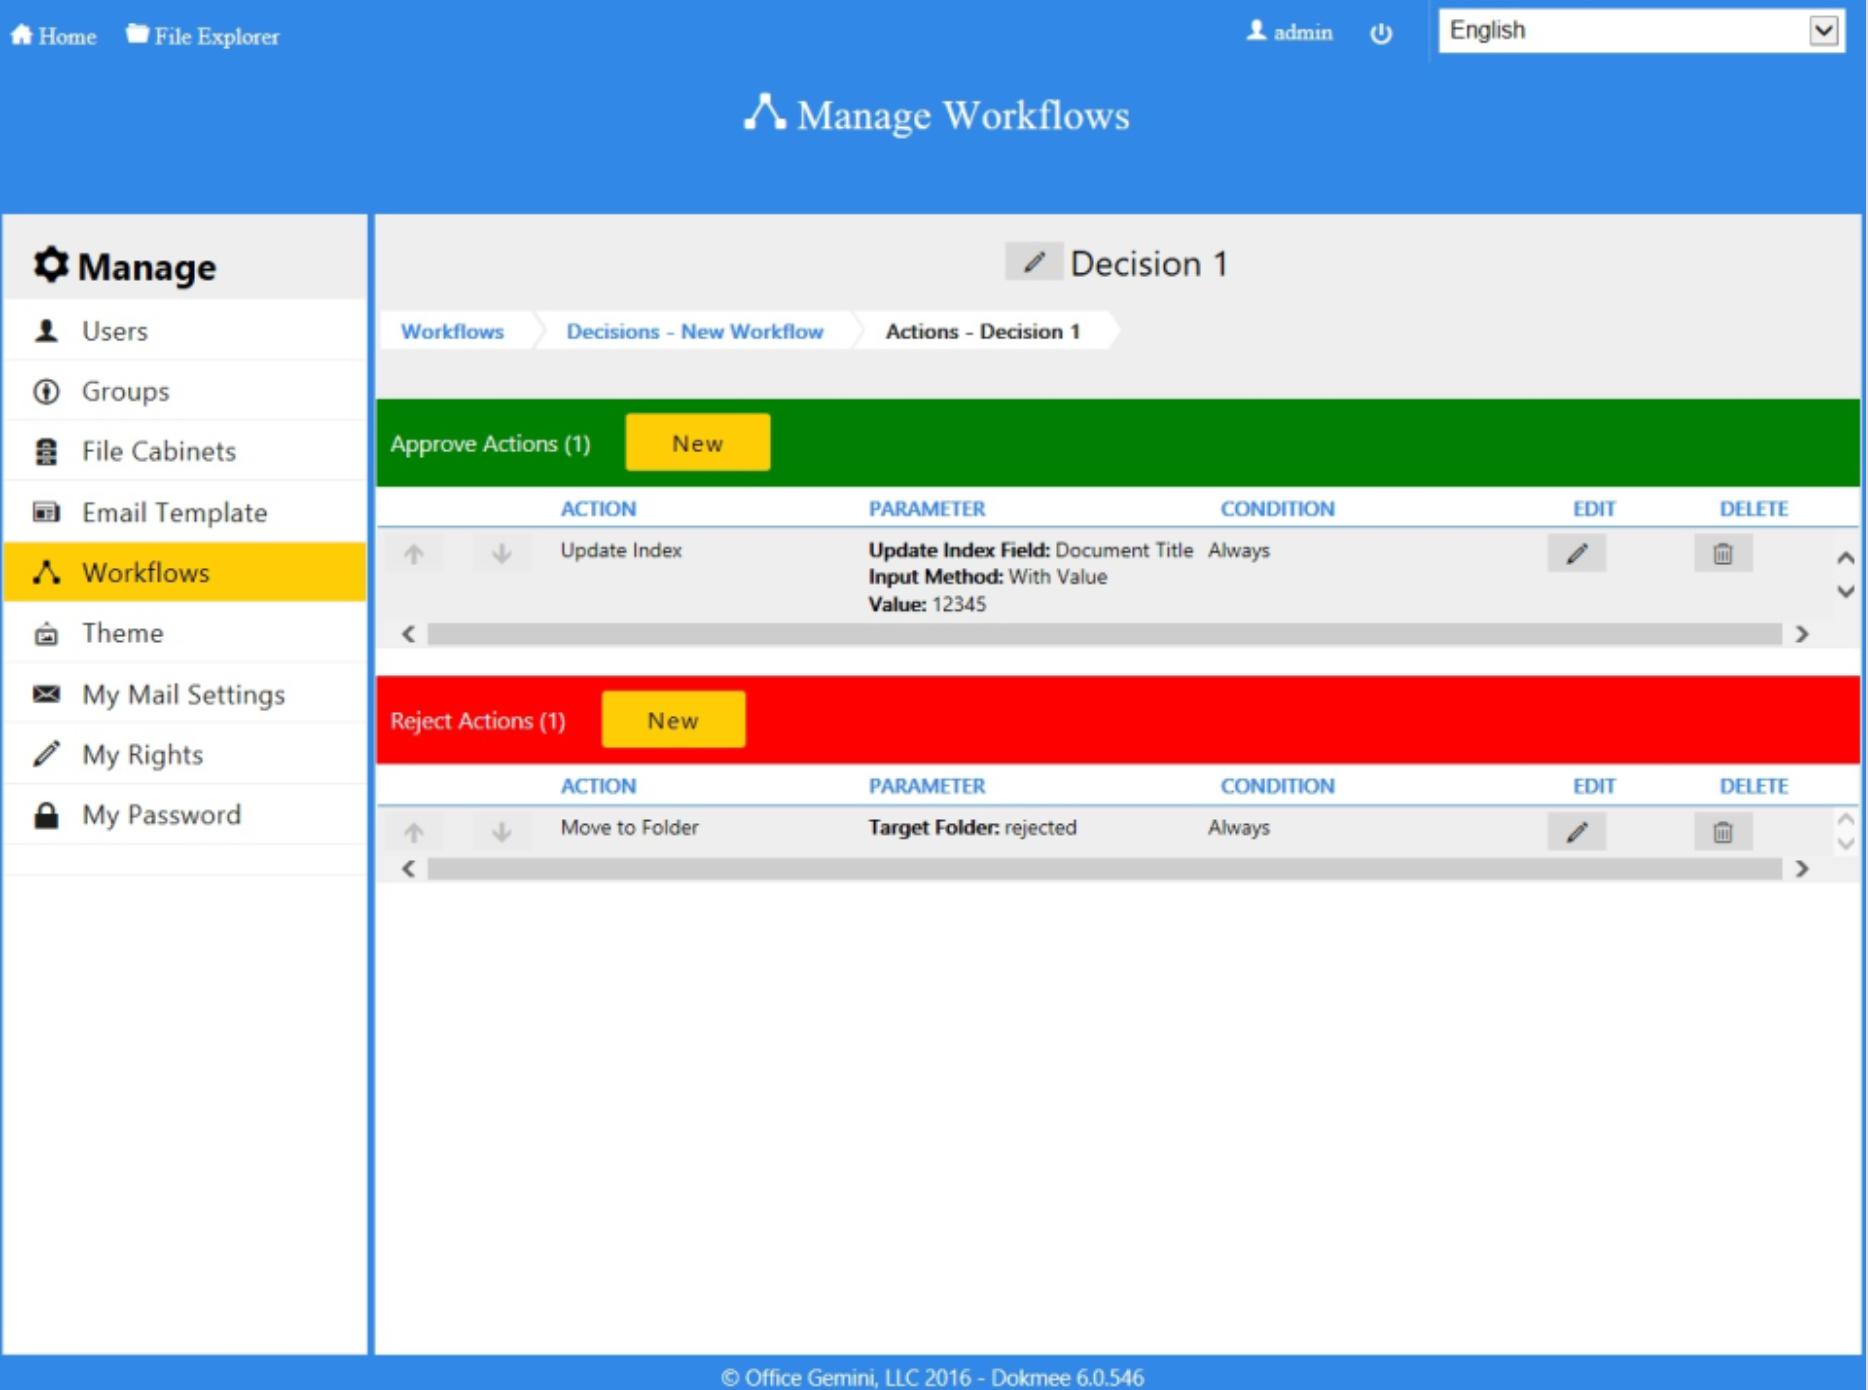 Dokmee - Manage workflows